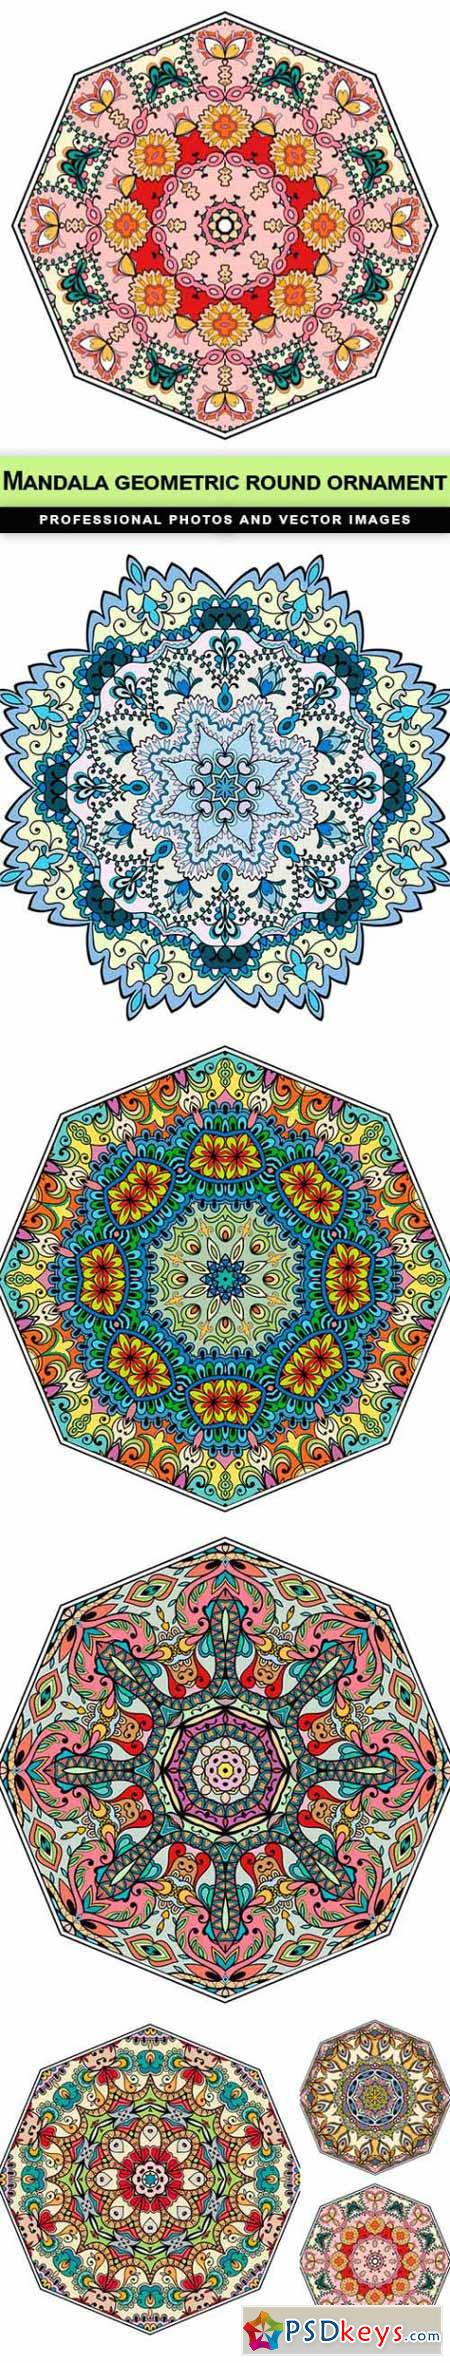 Mandala geometric round ornament - 6 EPS